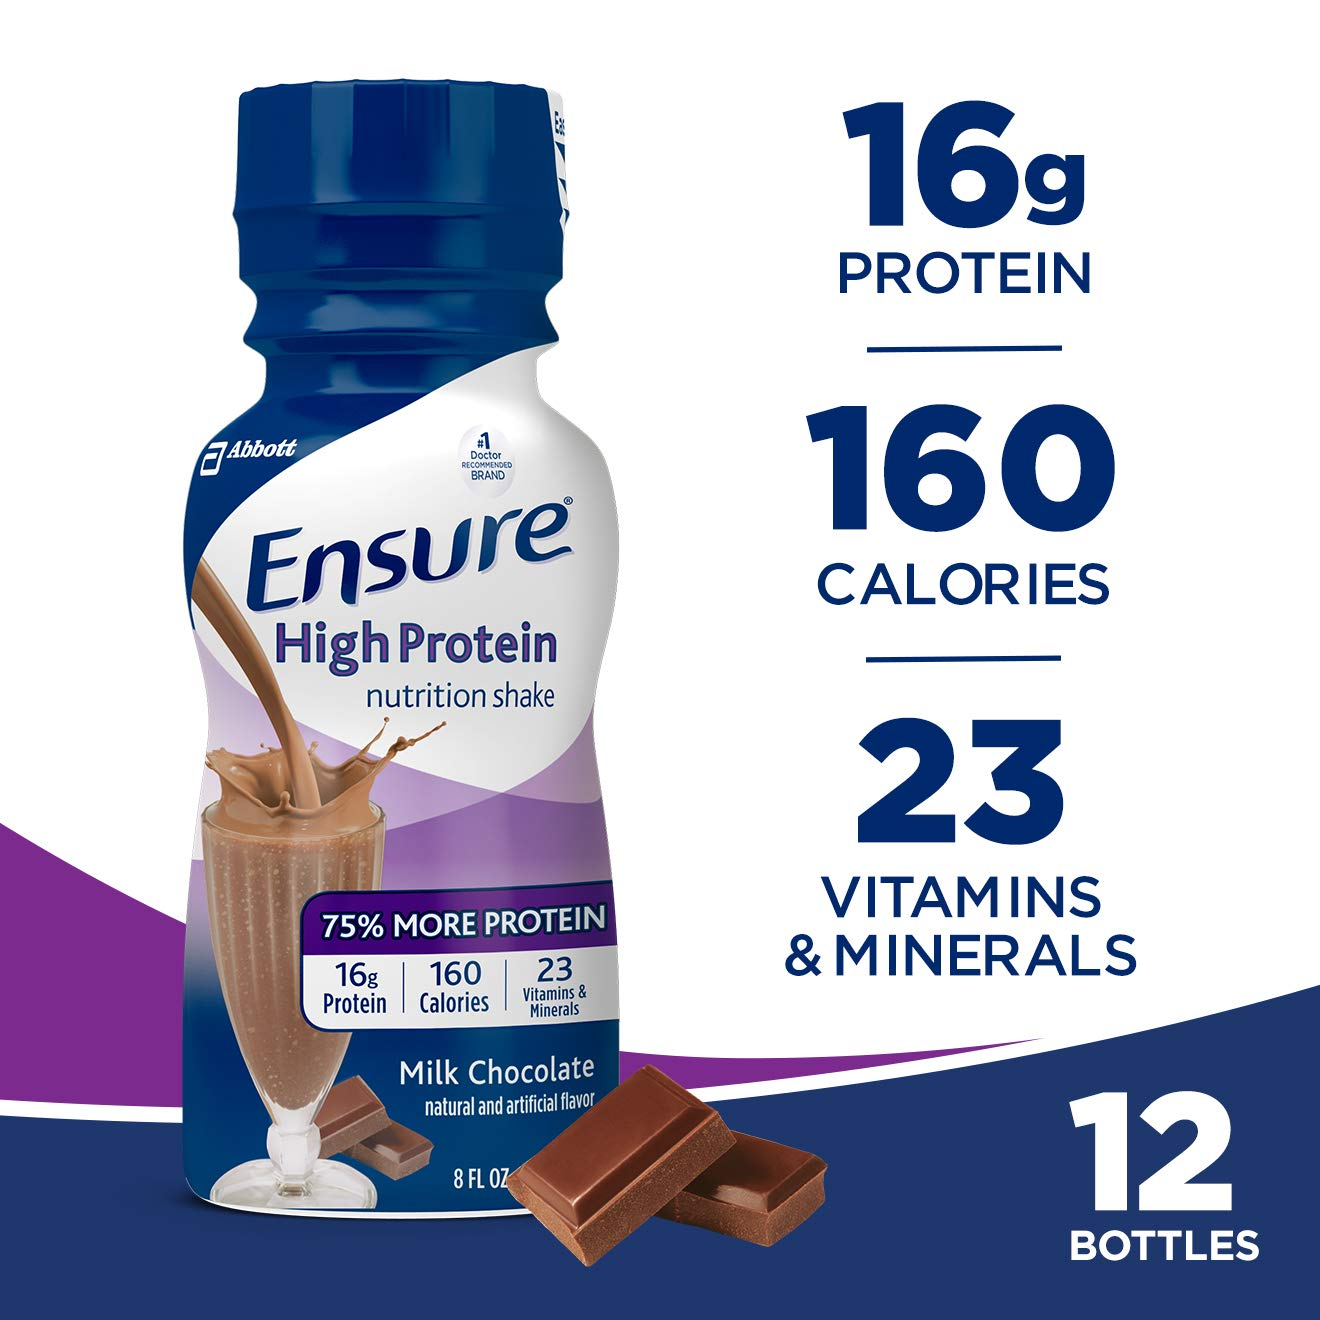 Boost Original Complete Nutritional Drink Vanilla Delight: Ensure Original Nutrition Shake With 9 Grams Of Protein